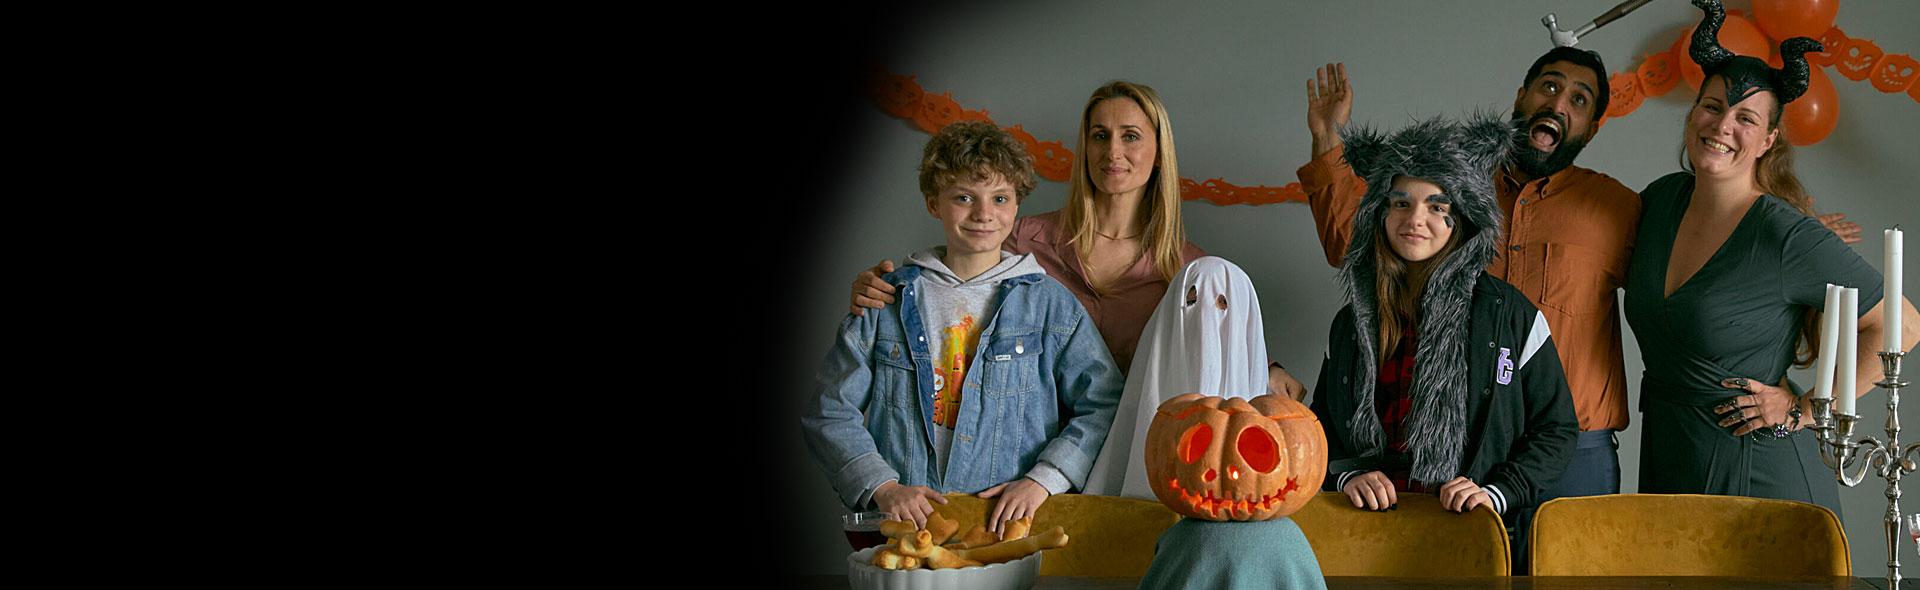 Forsvundet til Halloween_slide_poster